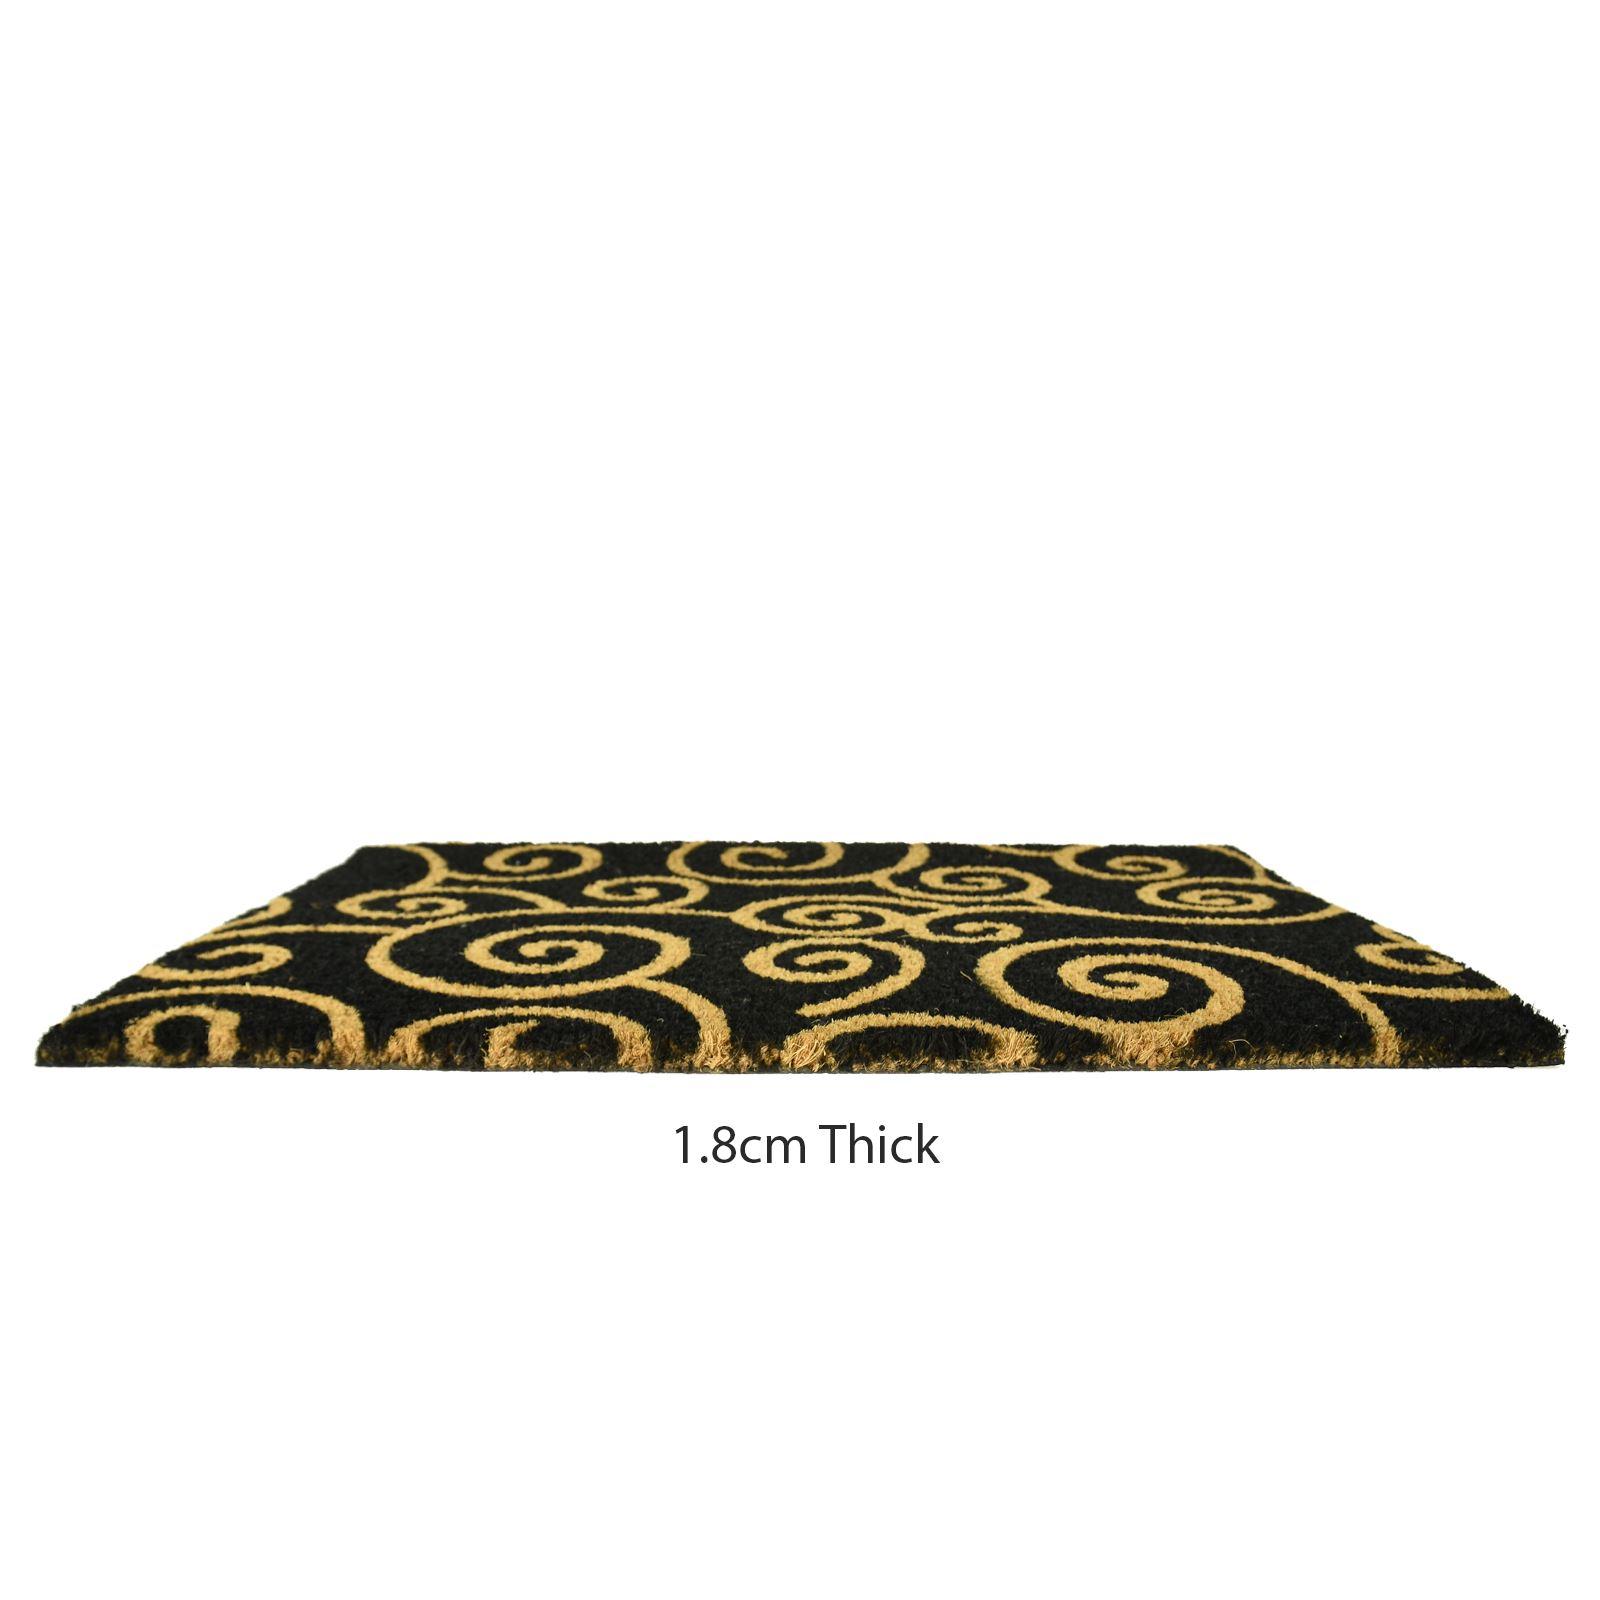 Plain-Non-Slip-Door-Mat-Tough-Natural-Coir-PVC-Back-Welcome-Doormat-40-x-60cm miniatura 109